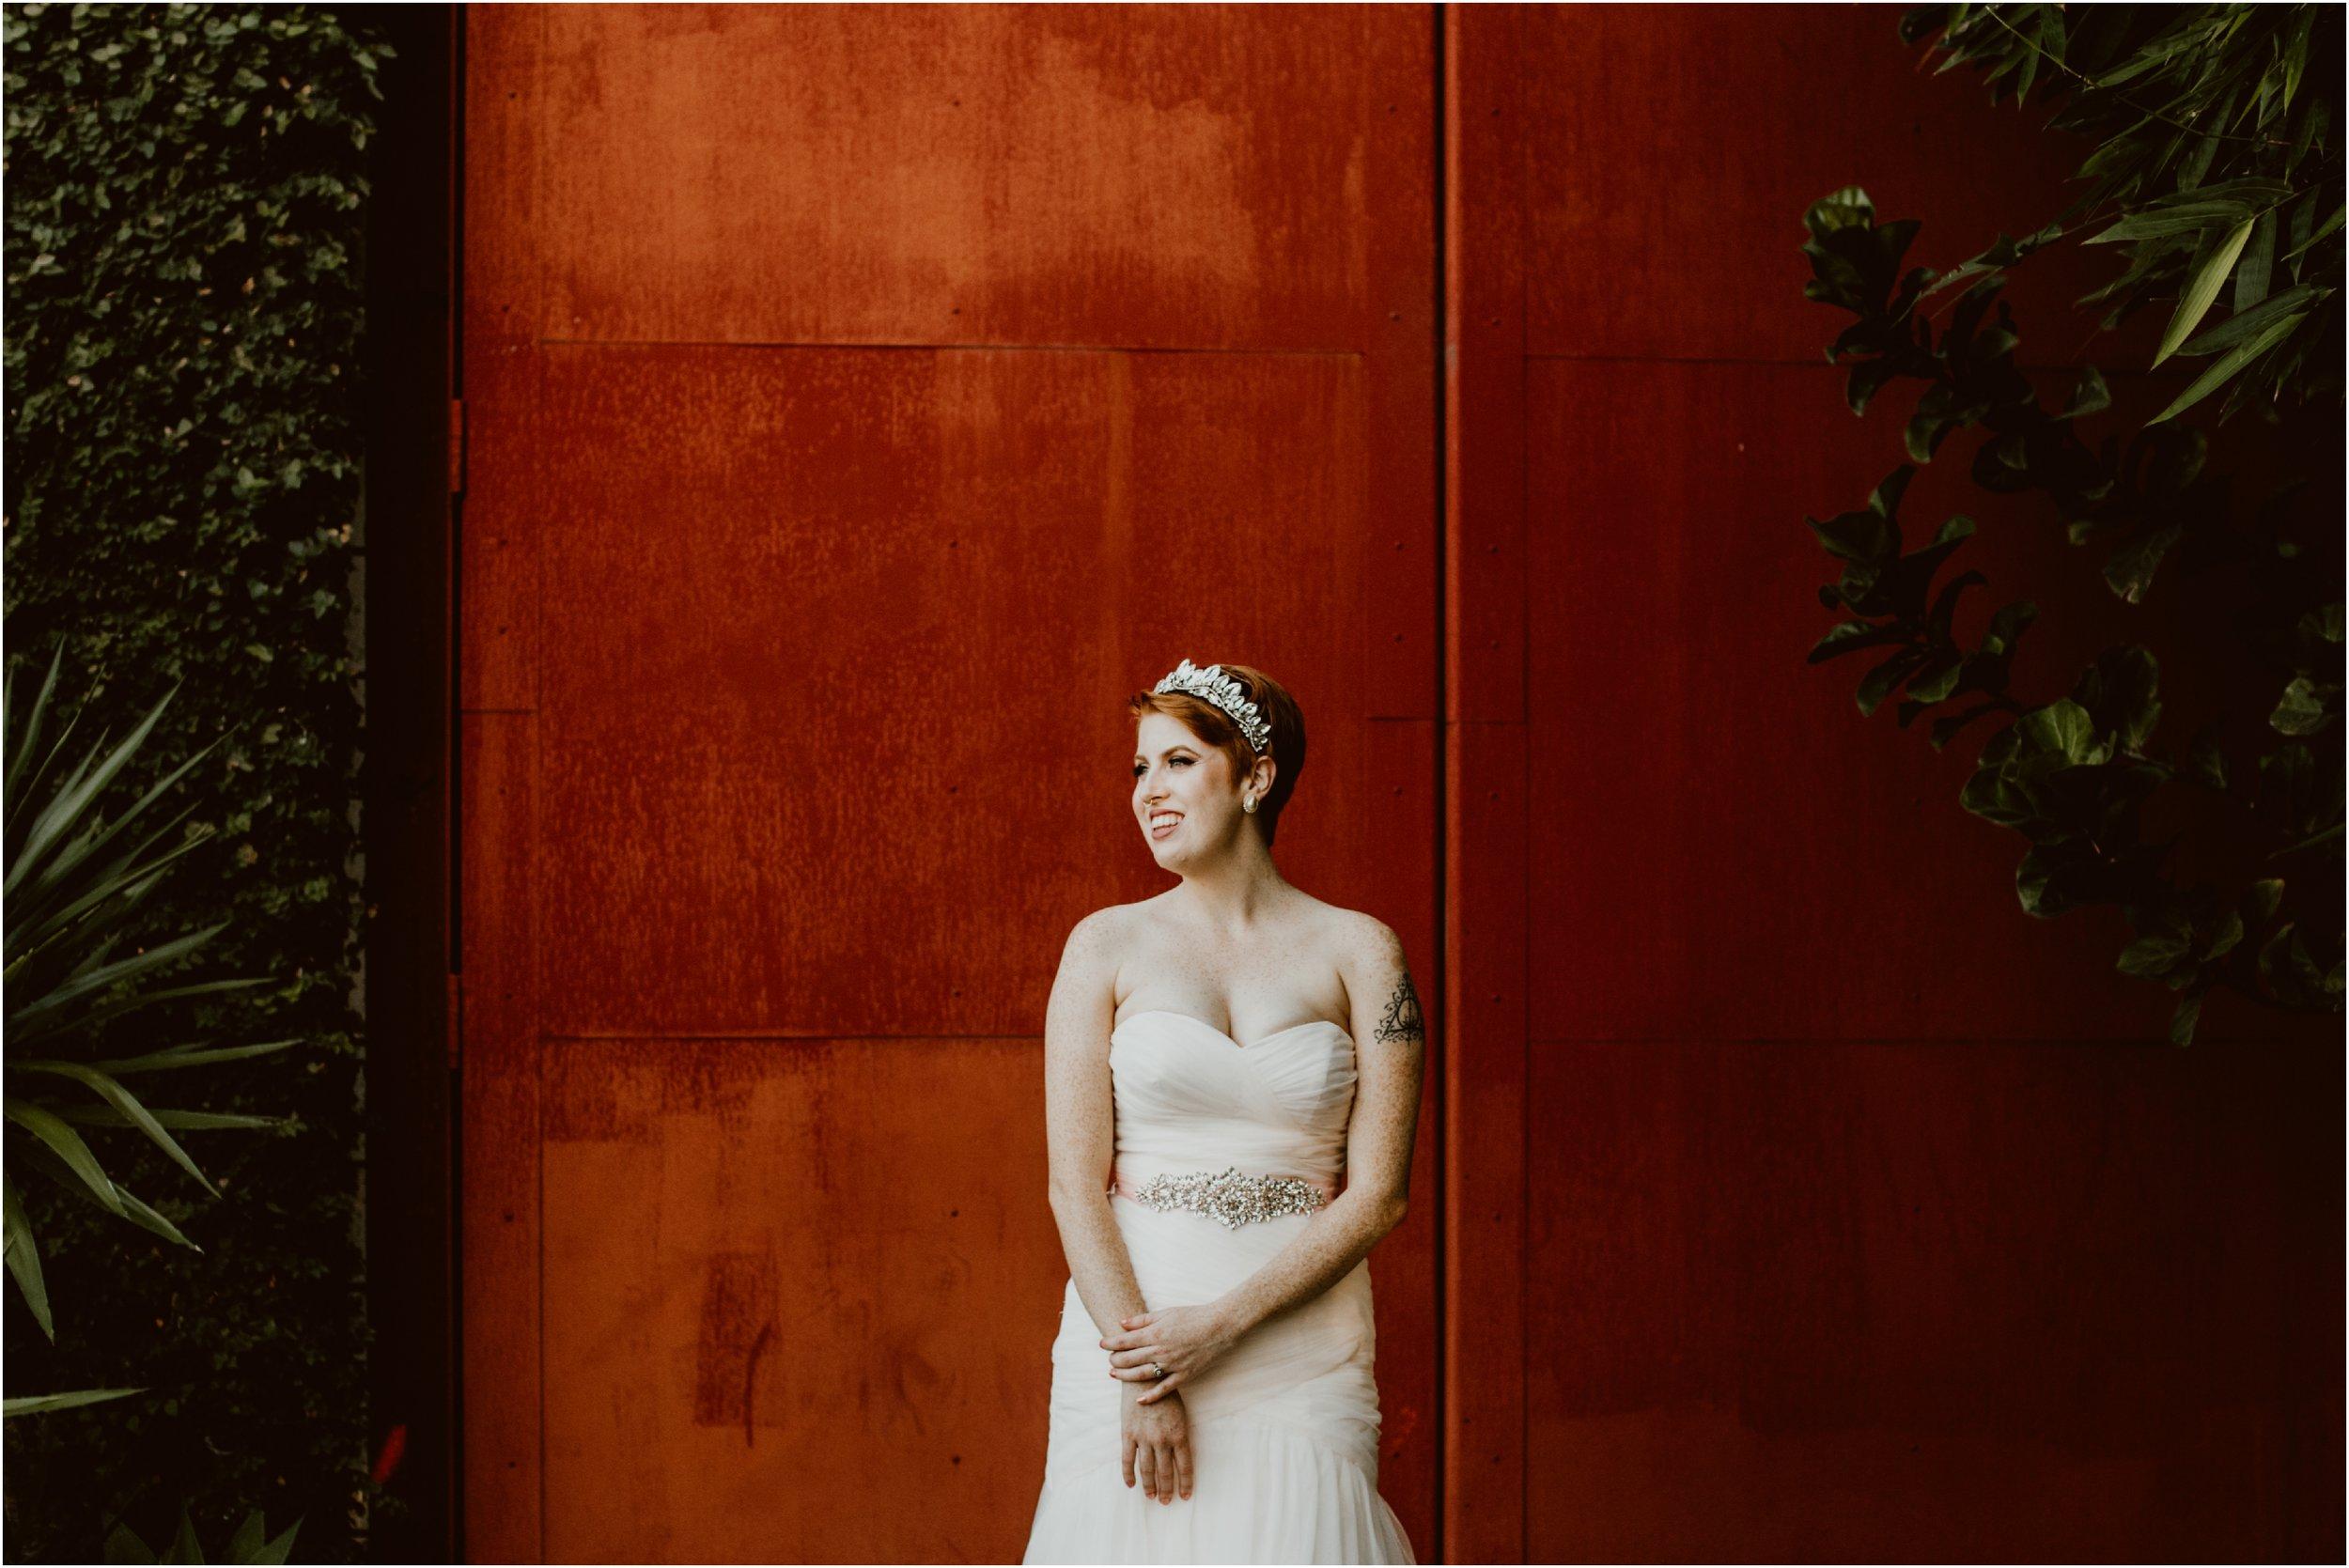 Smogshoppe-Wedding-S+C-Diana-Lake-Photography-716.jpg